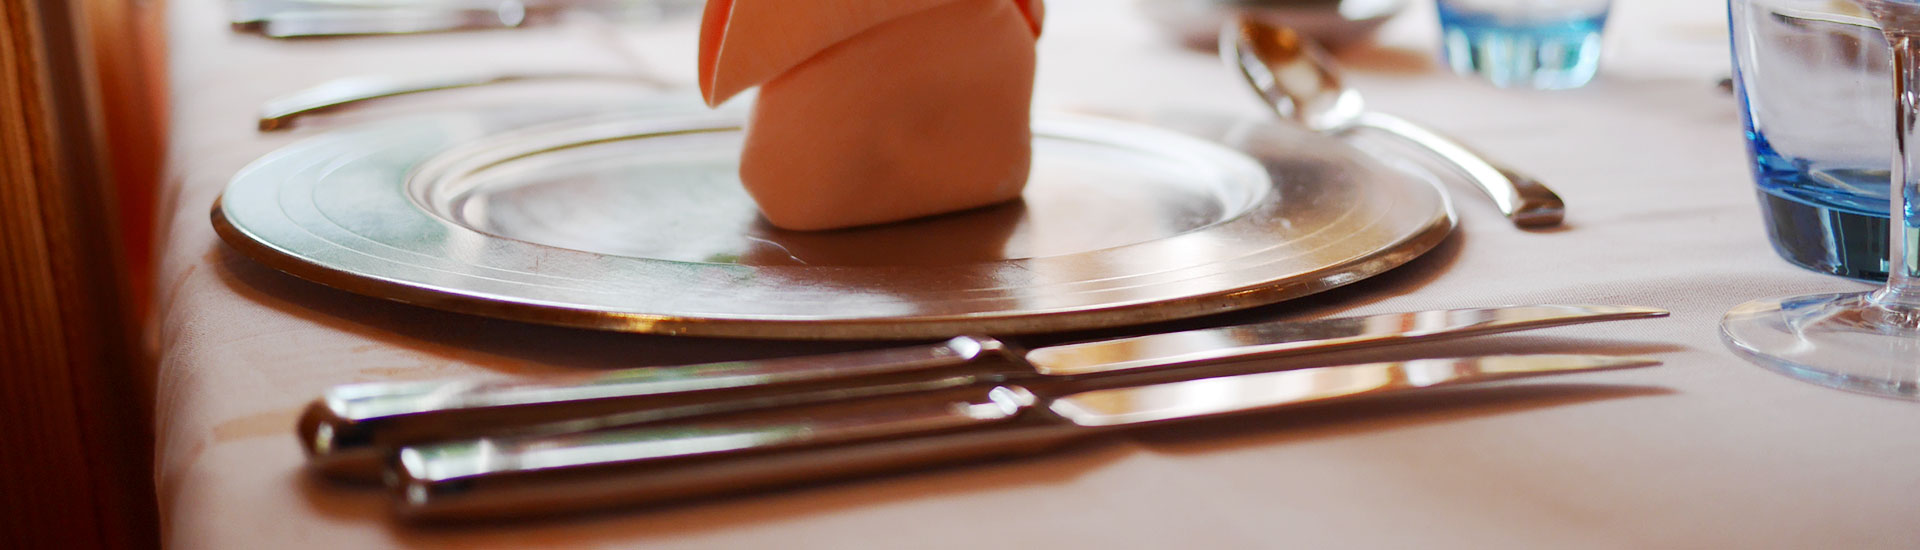 Le restaurant Auberge de Gilly